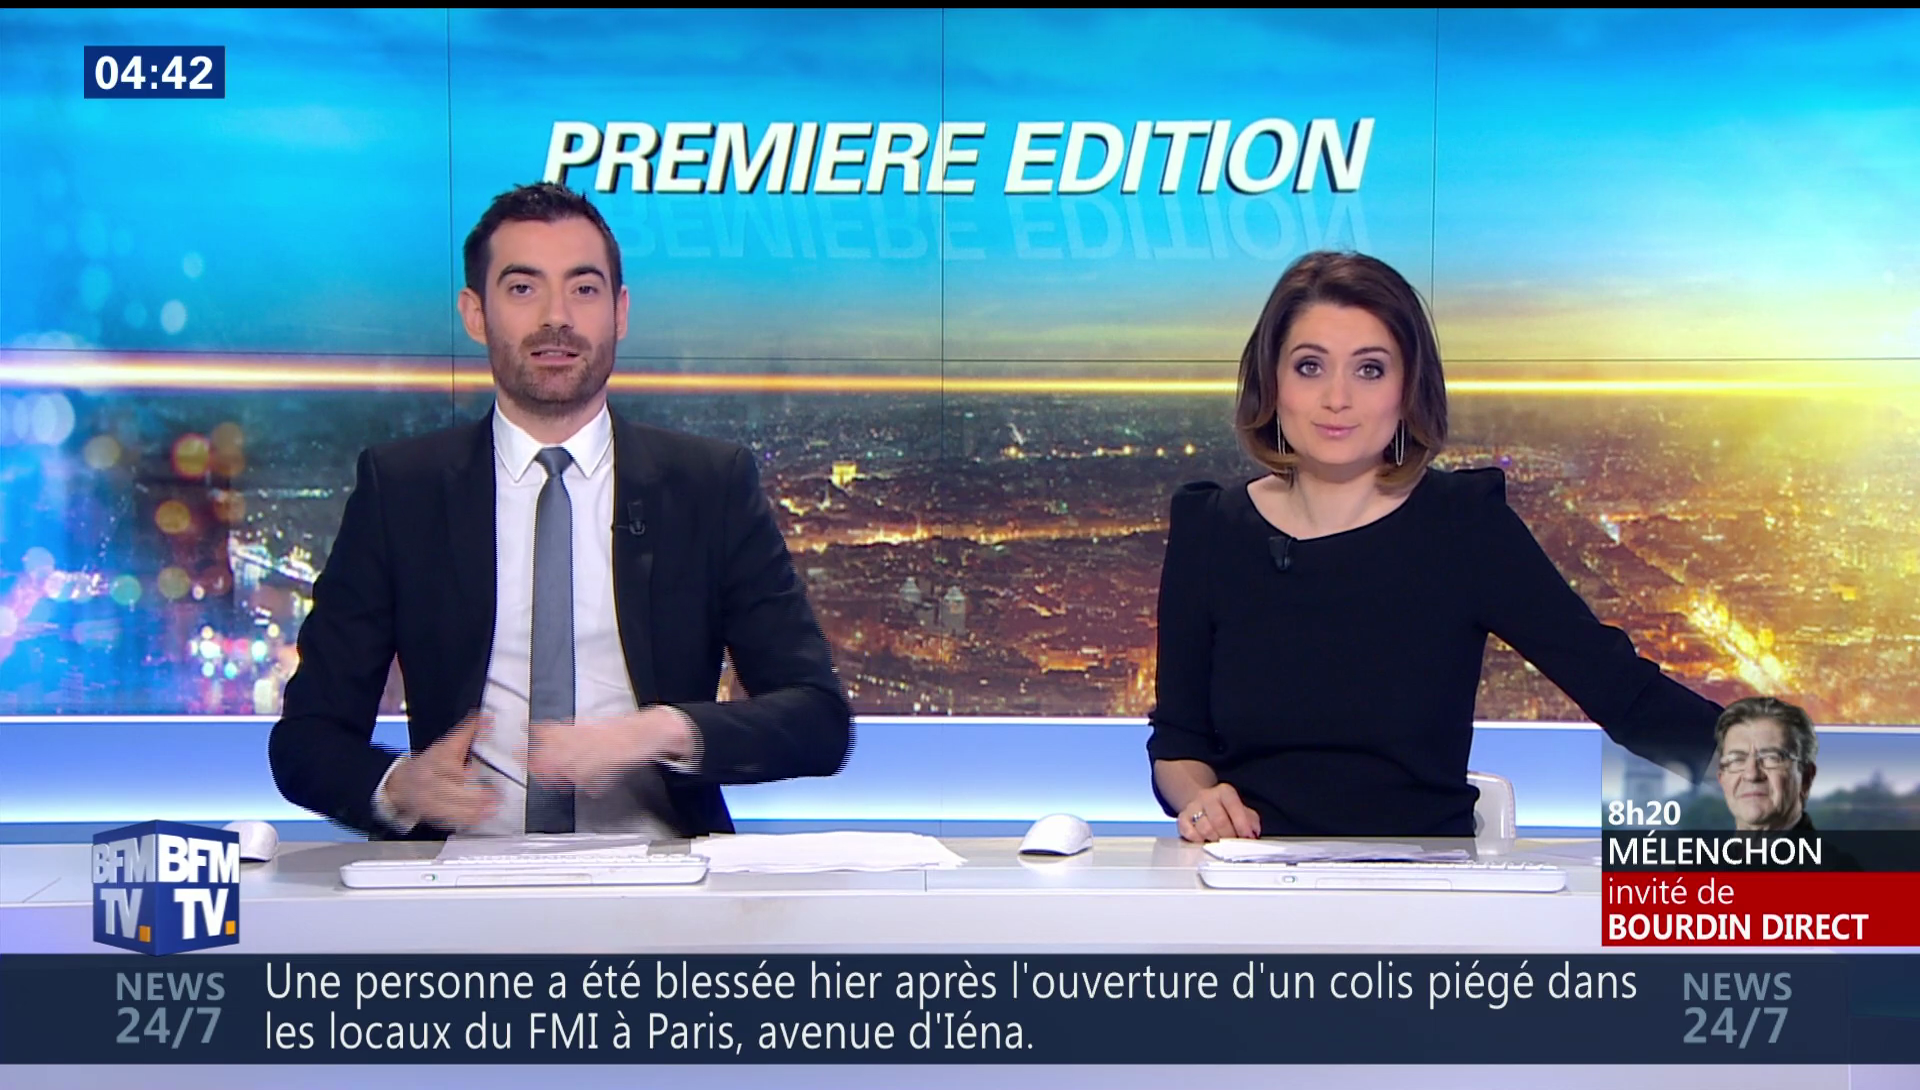 celinemoncel03.2017_03_17_premiereeditionBFMTV